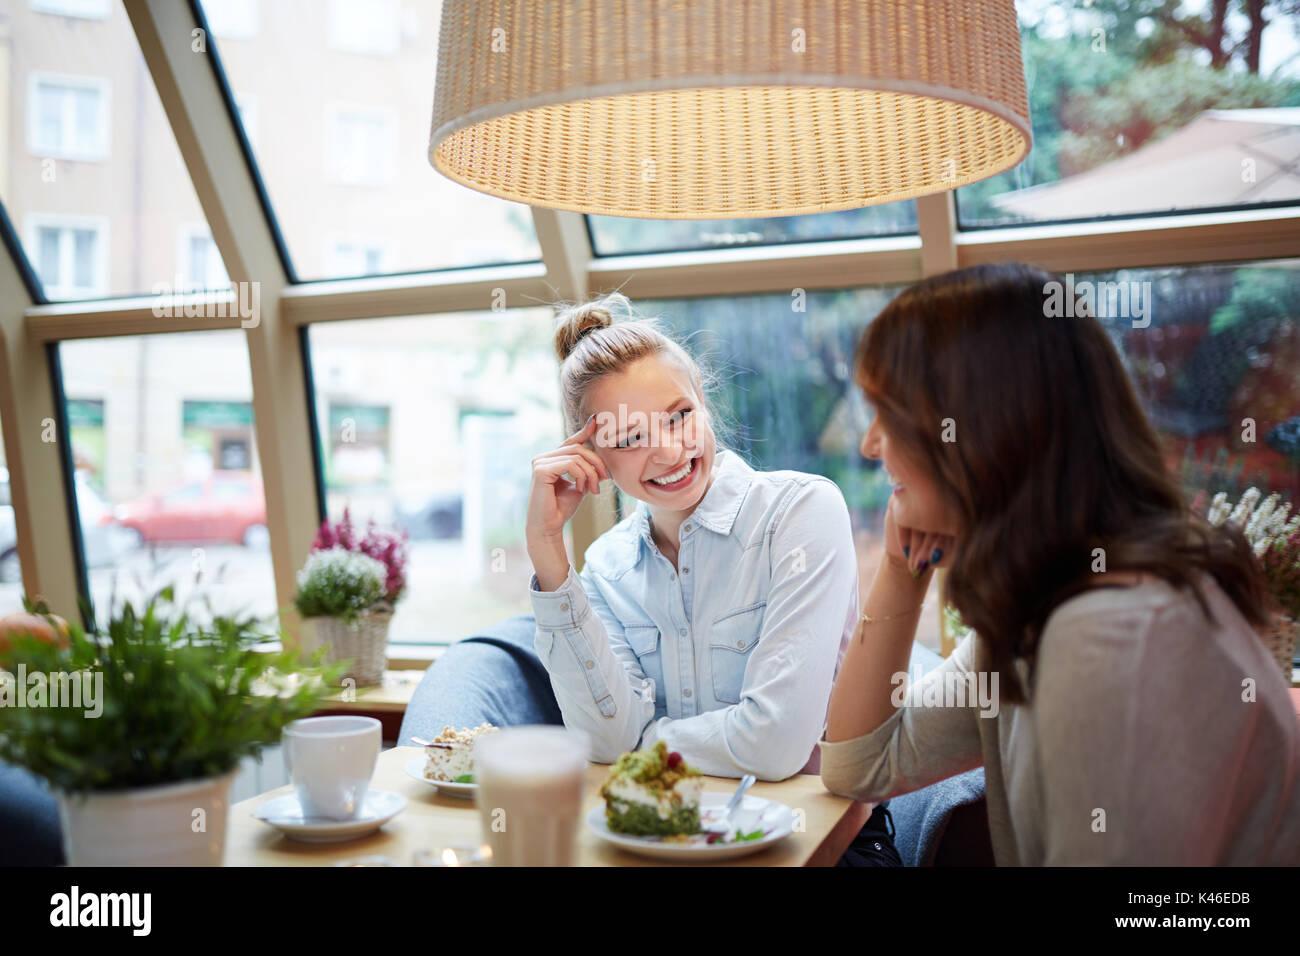 Porträt der jungen Frauen nette Gespräch im Cafe. Stockbild